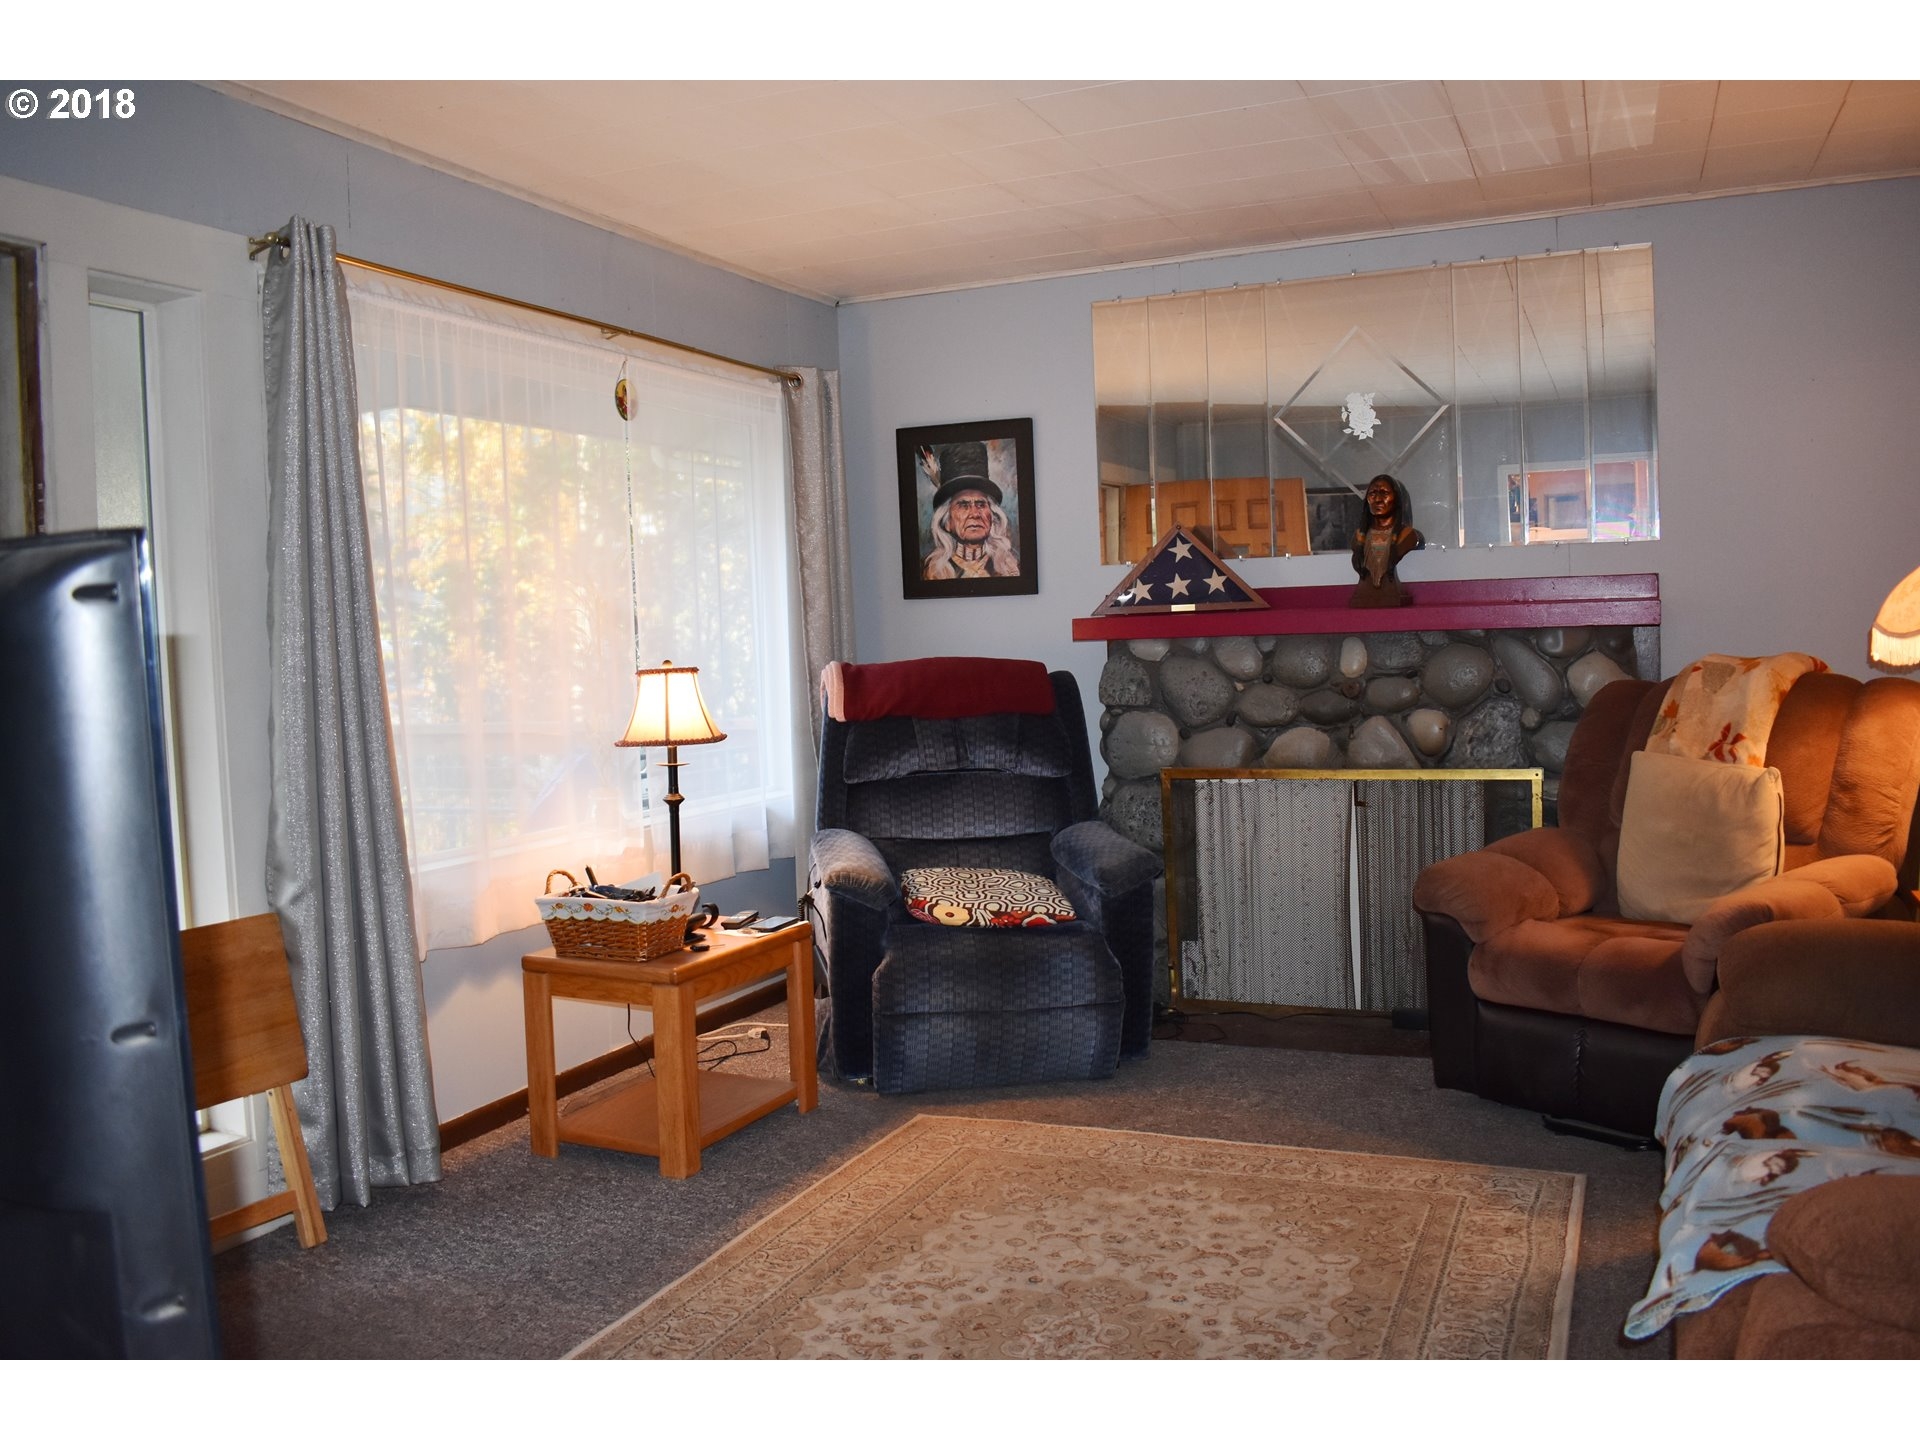 10926 N WILLIAMS AVE Portland, OR 97217 - MLS #: 18619639